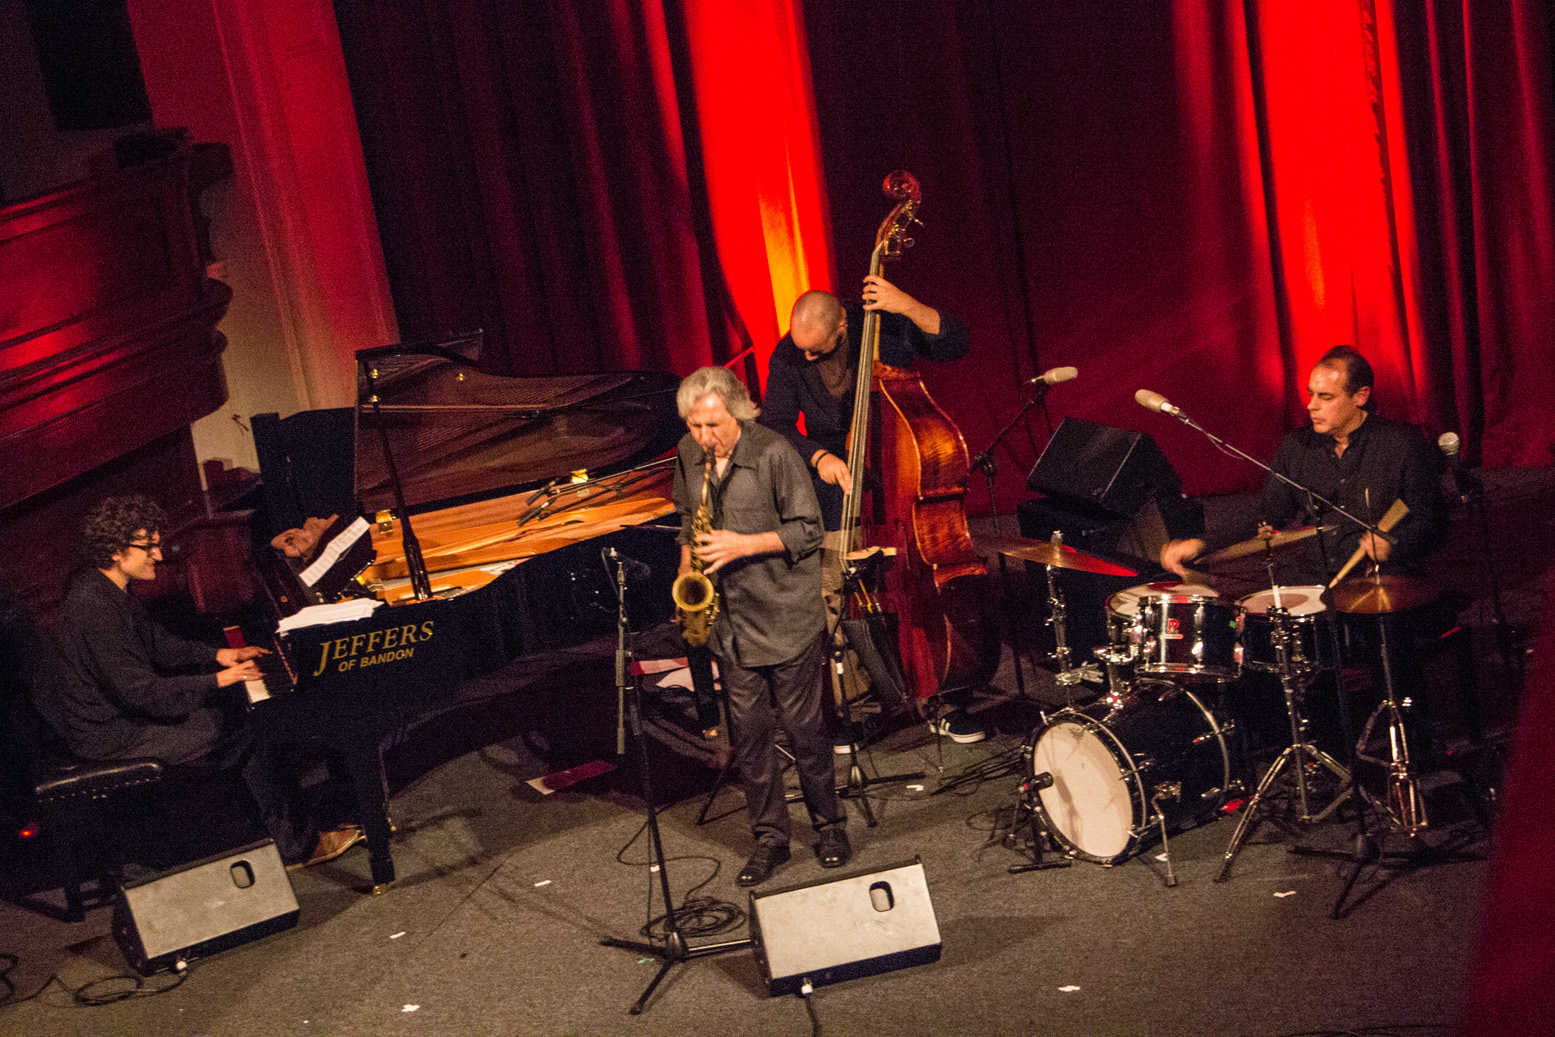 Perico sambeat quartet at cork jazz festival 2013